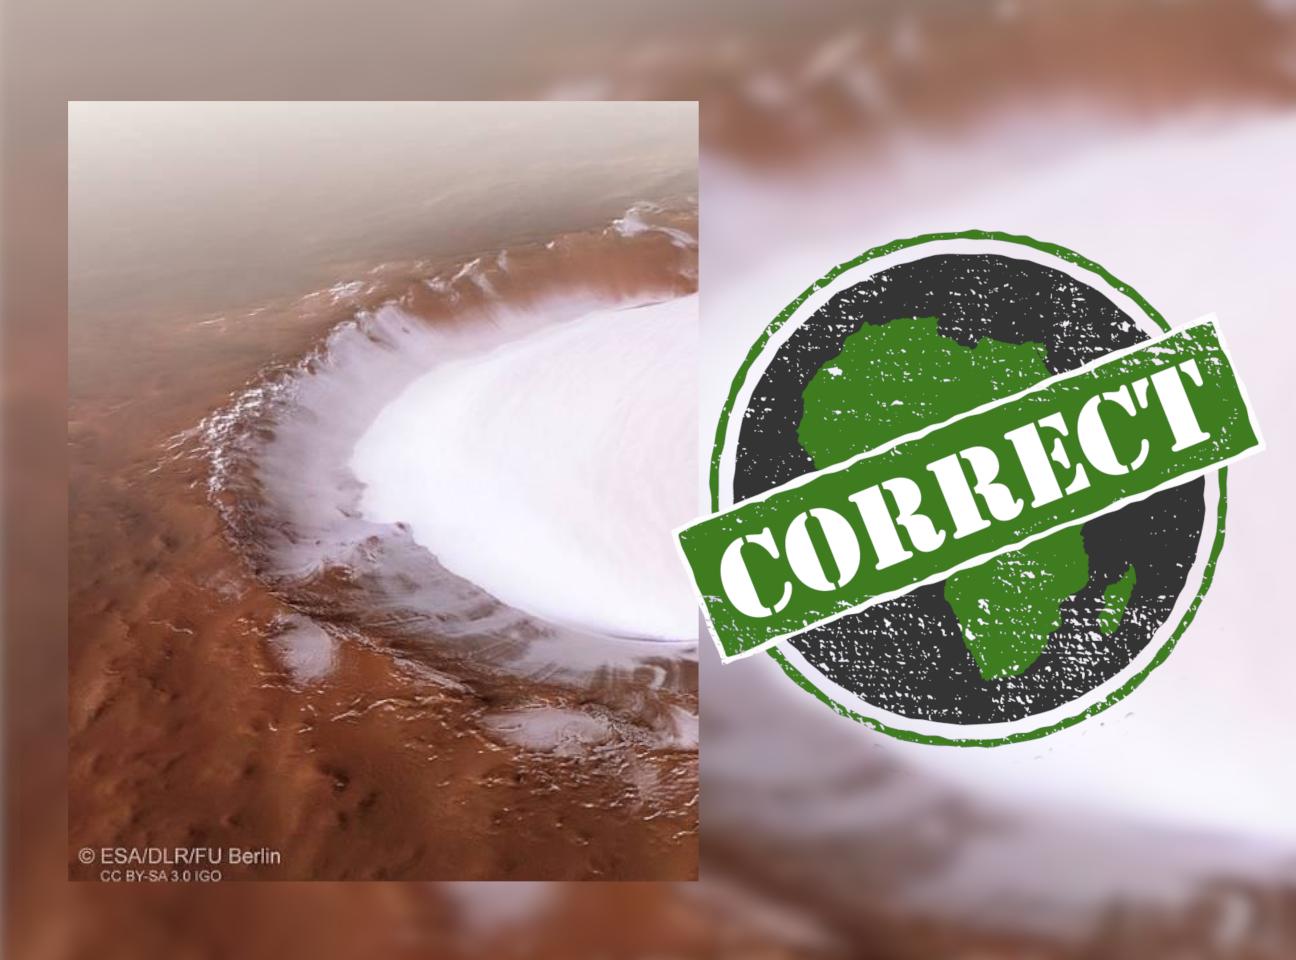 Mars_Correct